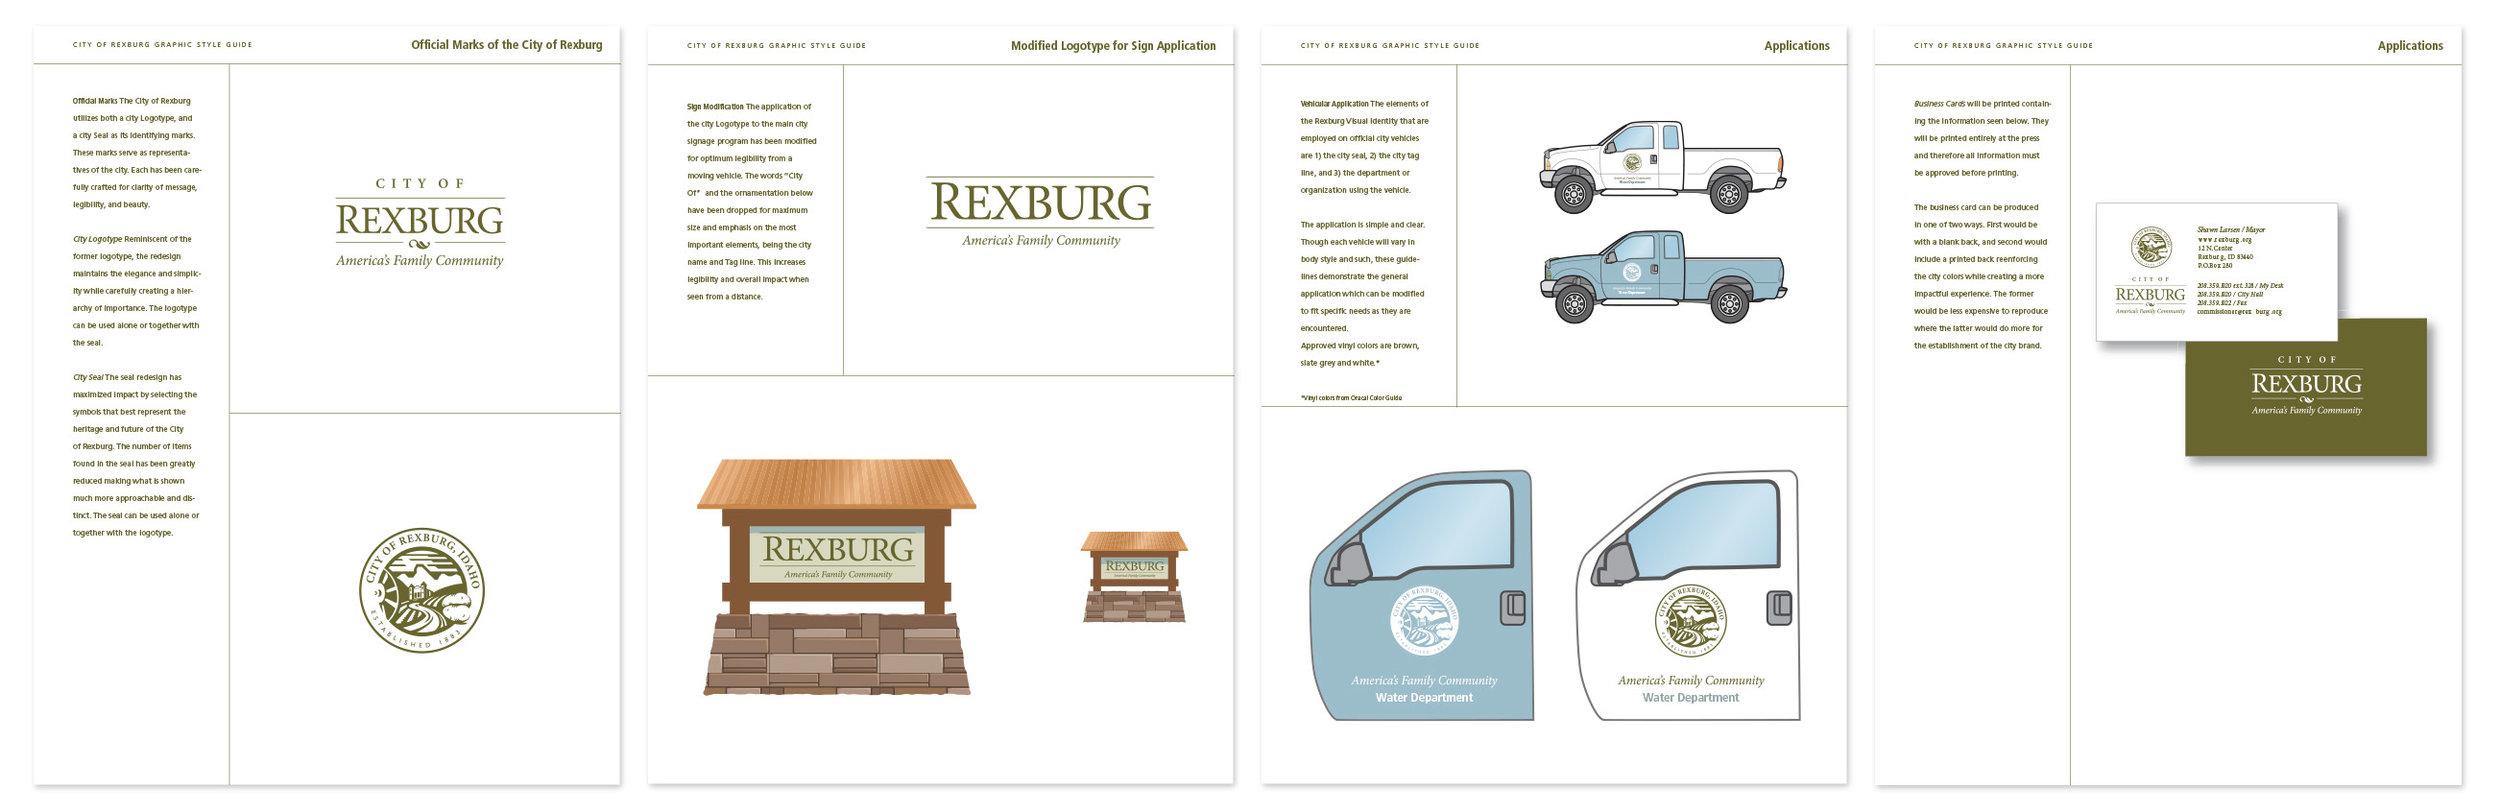 City of Rexburg - DESIGN STANDARDS